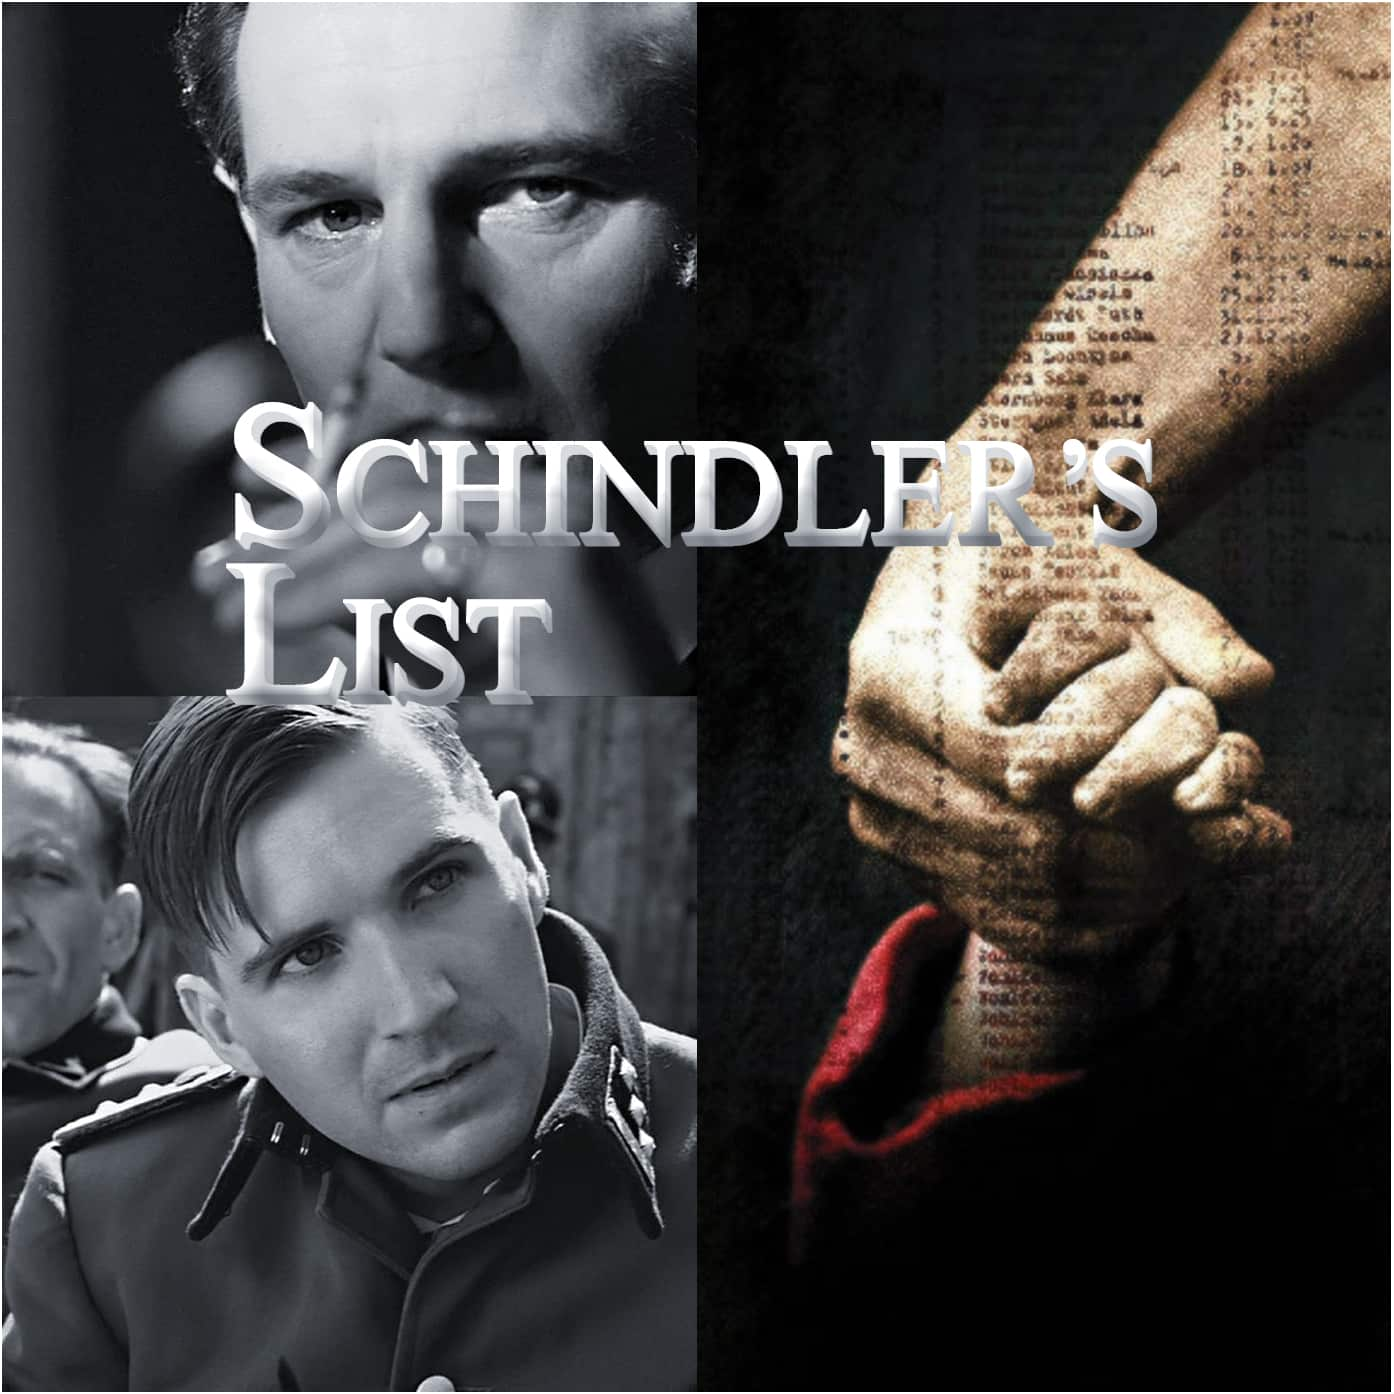 essay on schindlers list movie